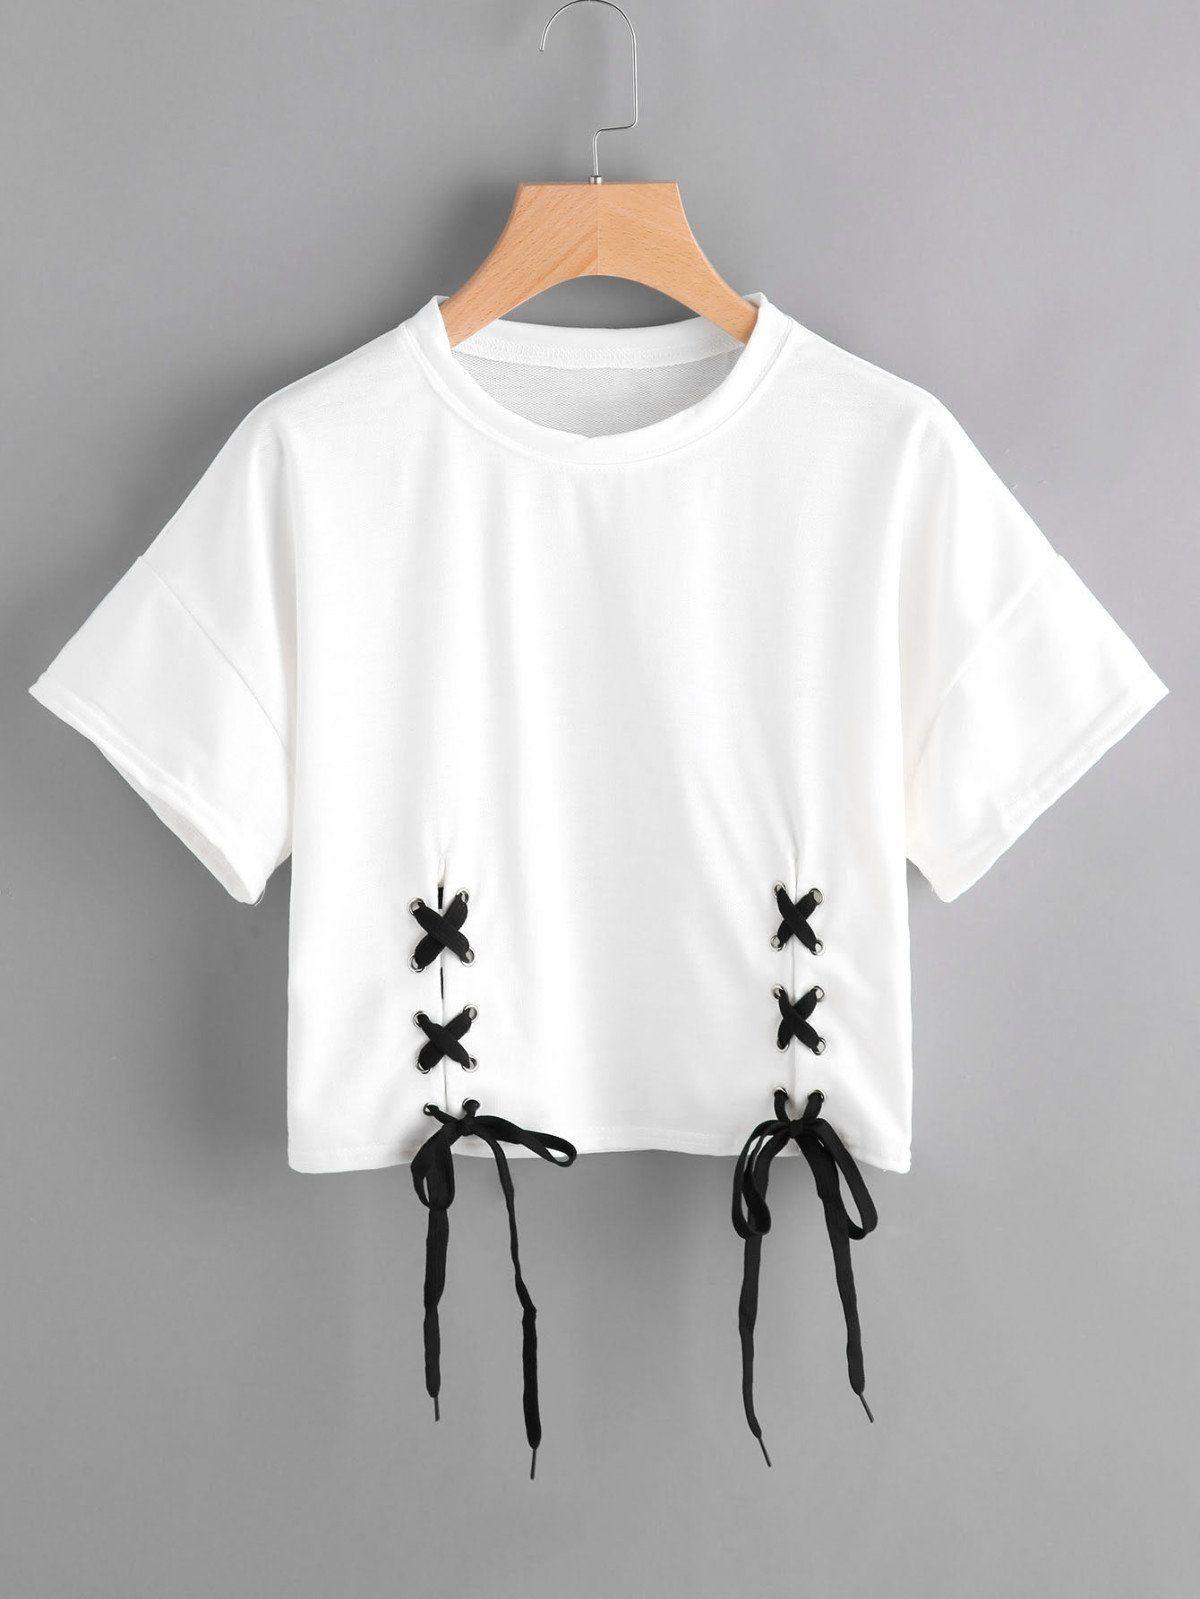 T-Shirts by BORNTOWEAR. Double Grommet Lace Up Hem Tee